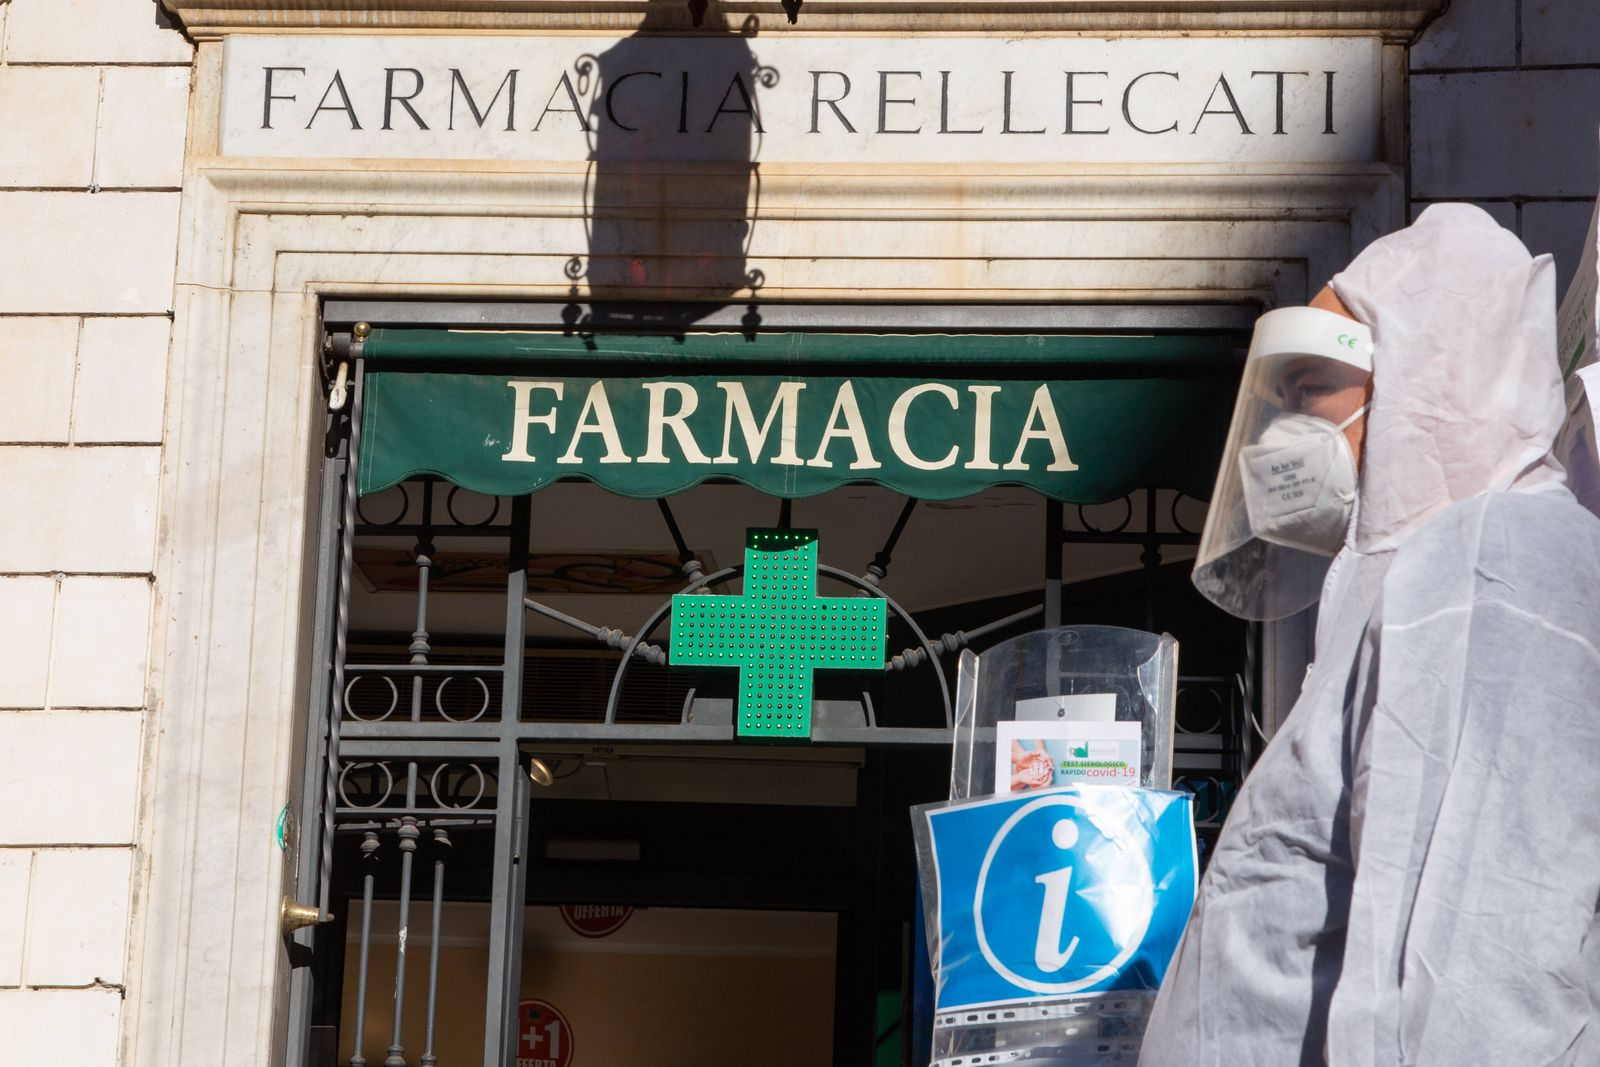 Italy: Rapid Swabs also in Pharmacies in Rome In Piazza Santa Maria in Trastevere in Rome, Rellecati pharmacy has insta